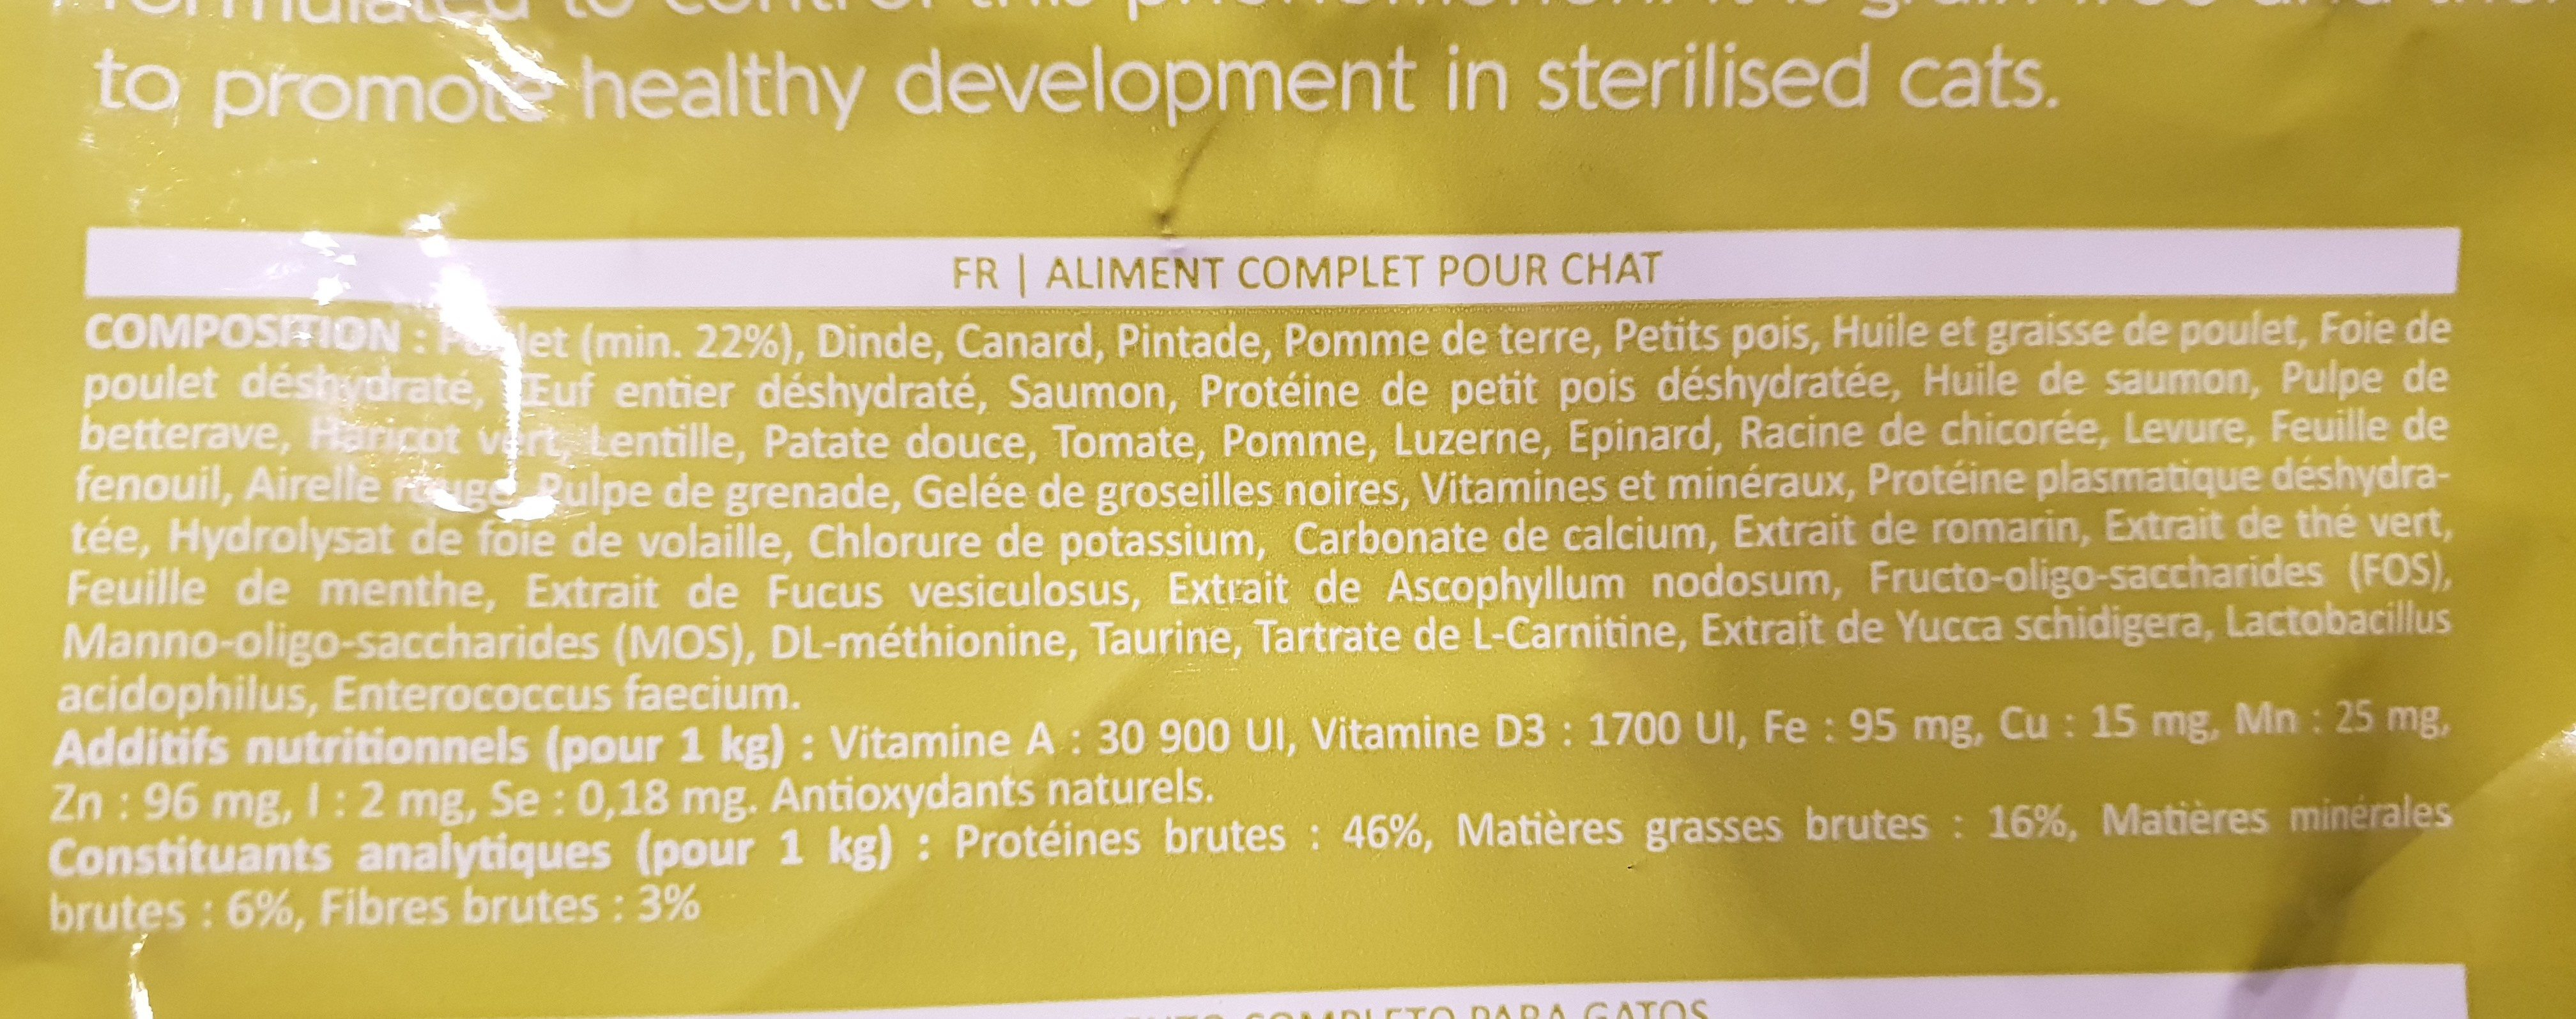 inne pet food - Nutrition facts - fr